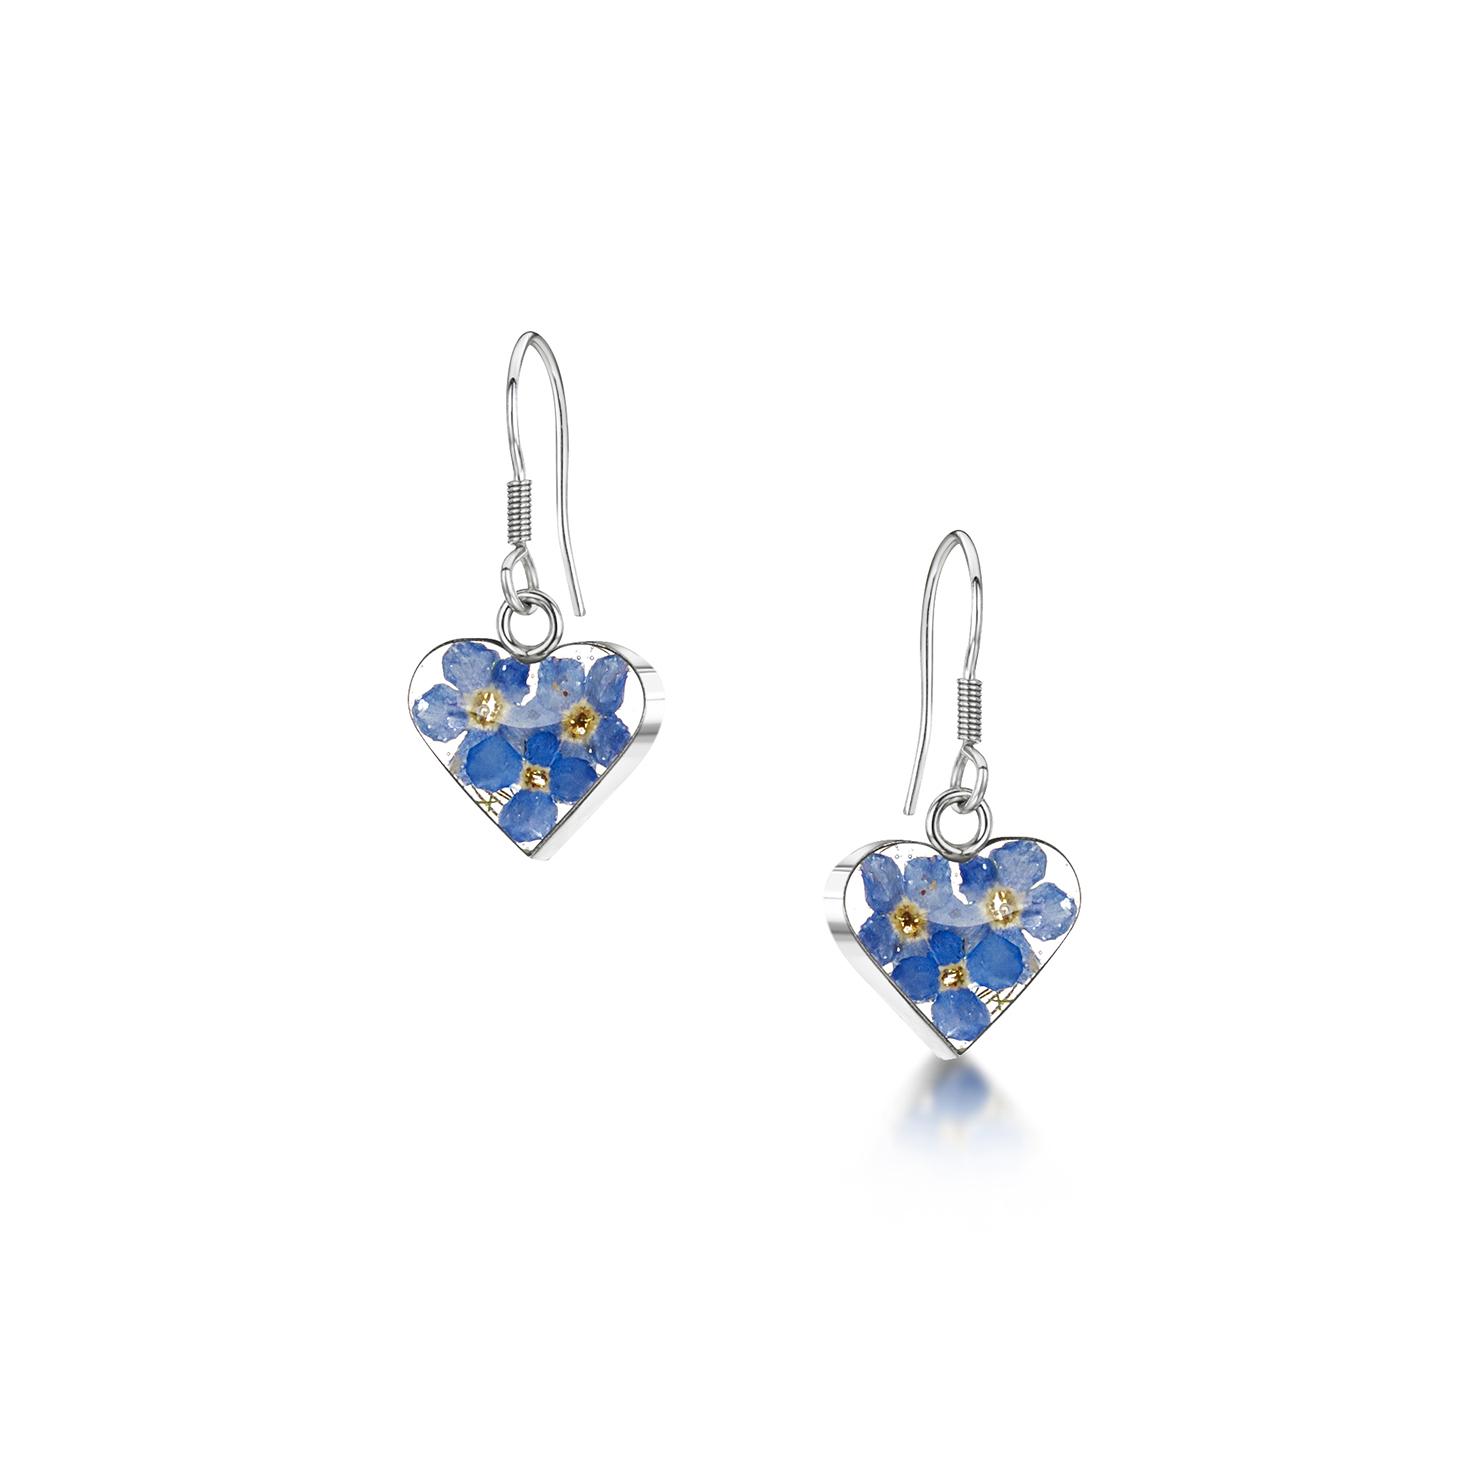 Shrieking Violet – Forget-me-not Silver Small Heart Drop Earrings in Gift Box